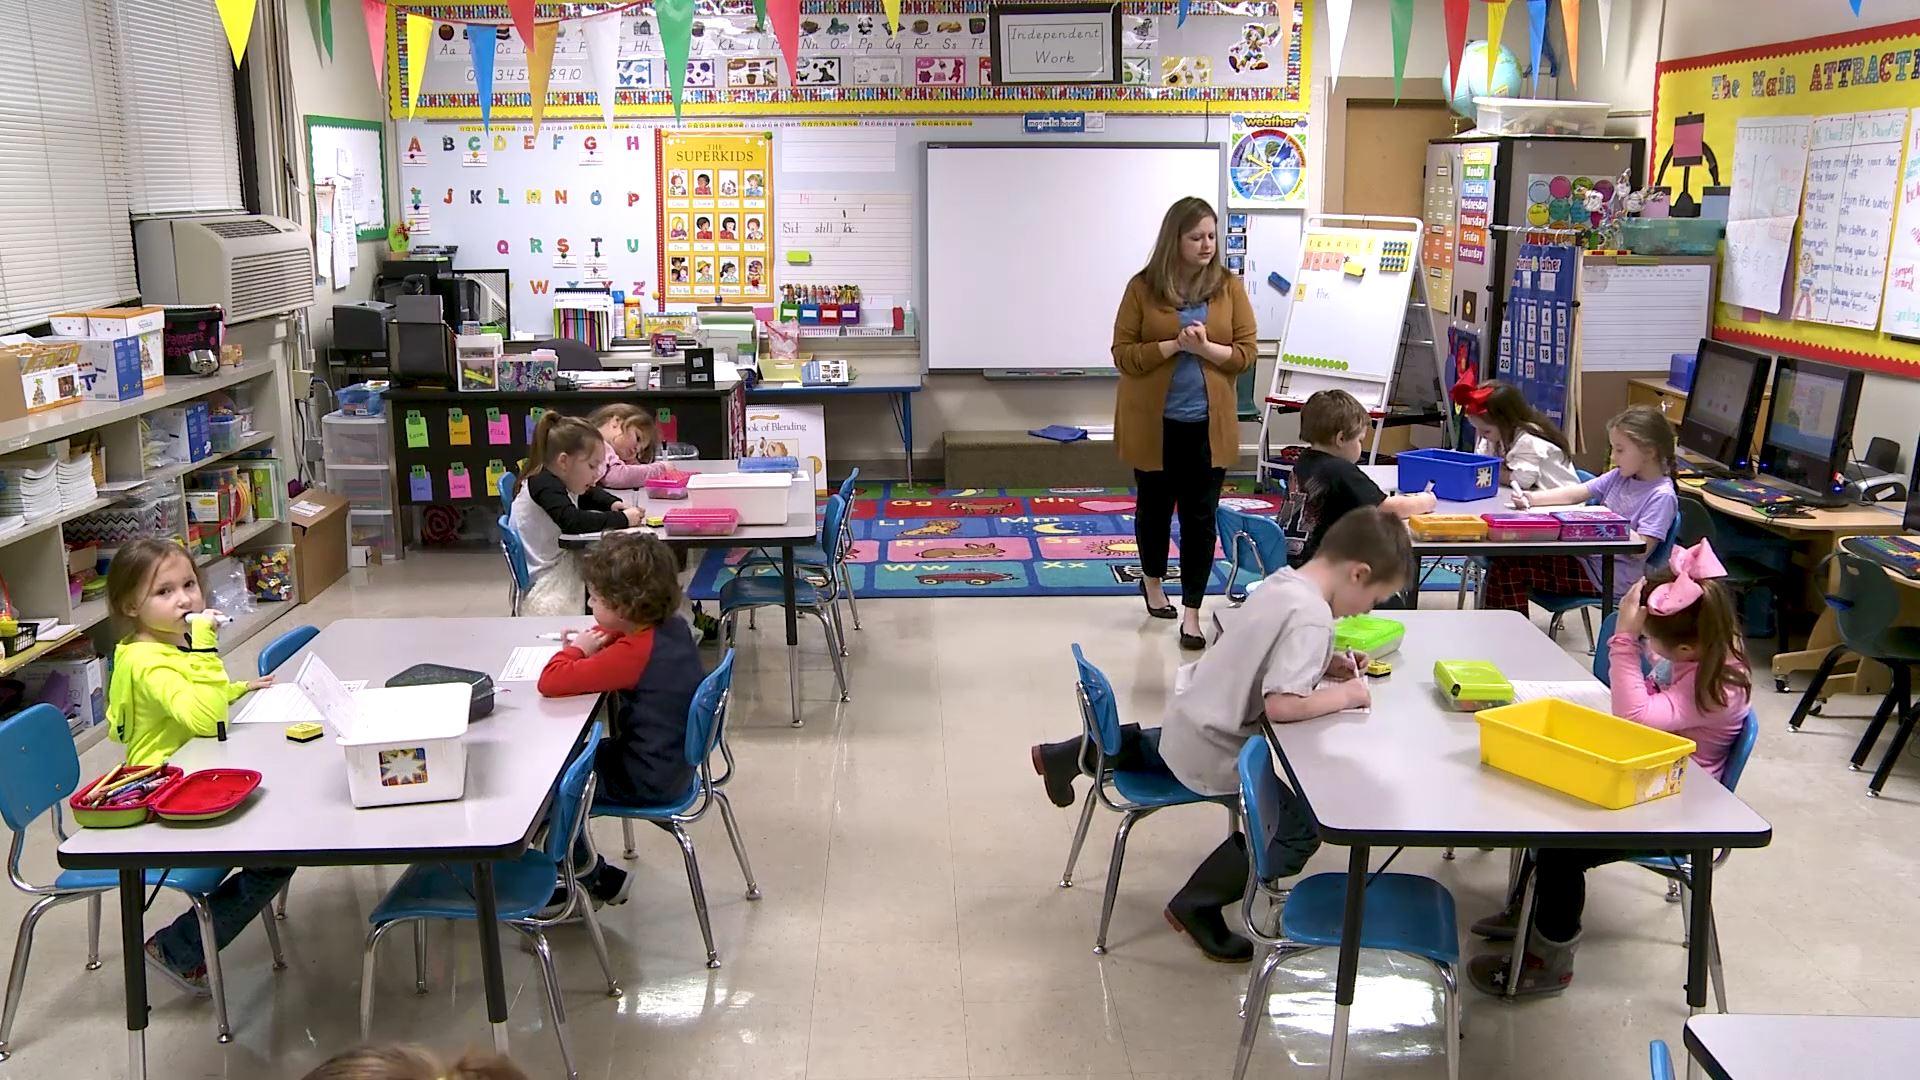 Matthews Elementary School